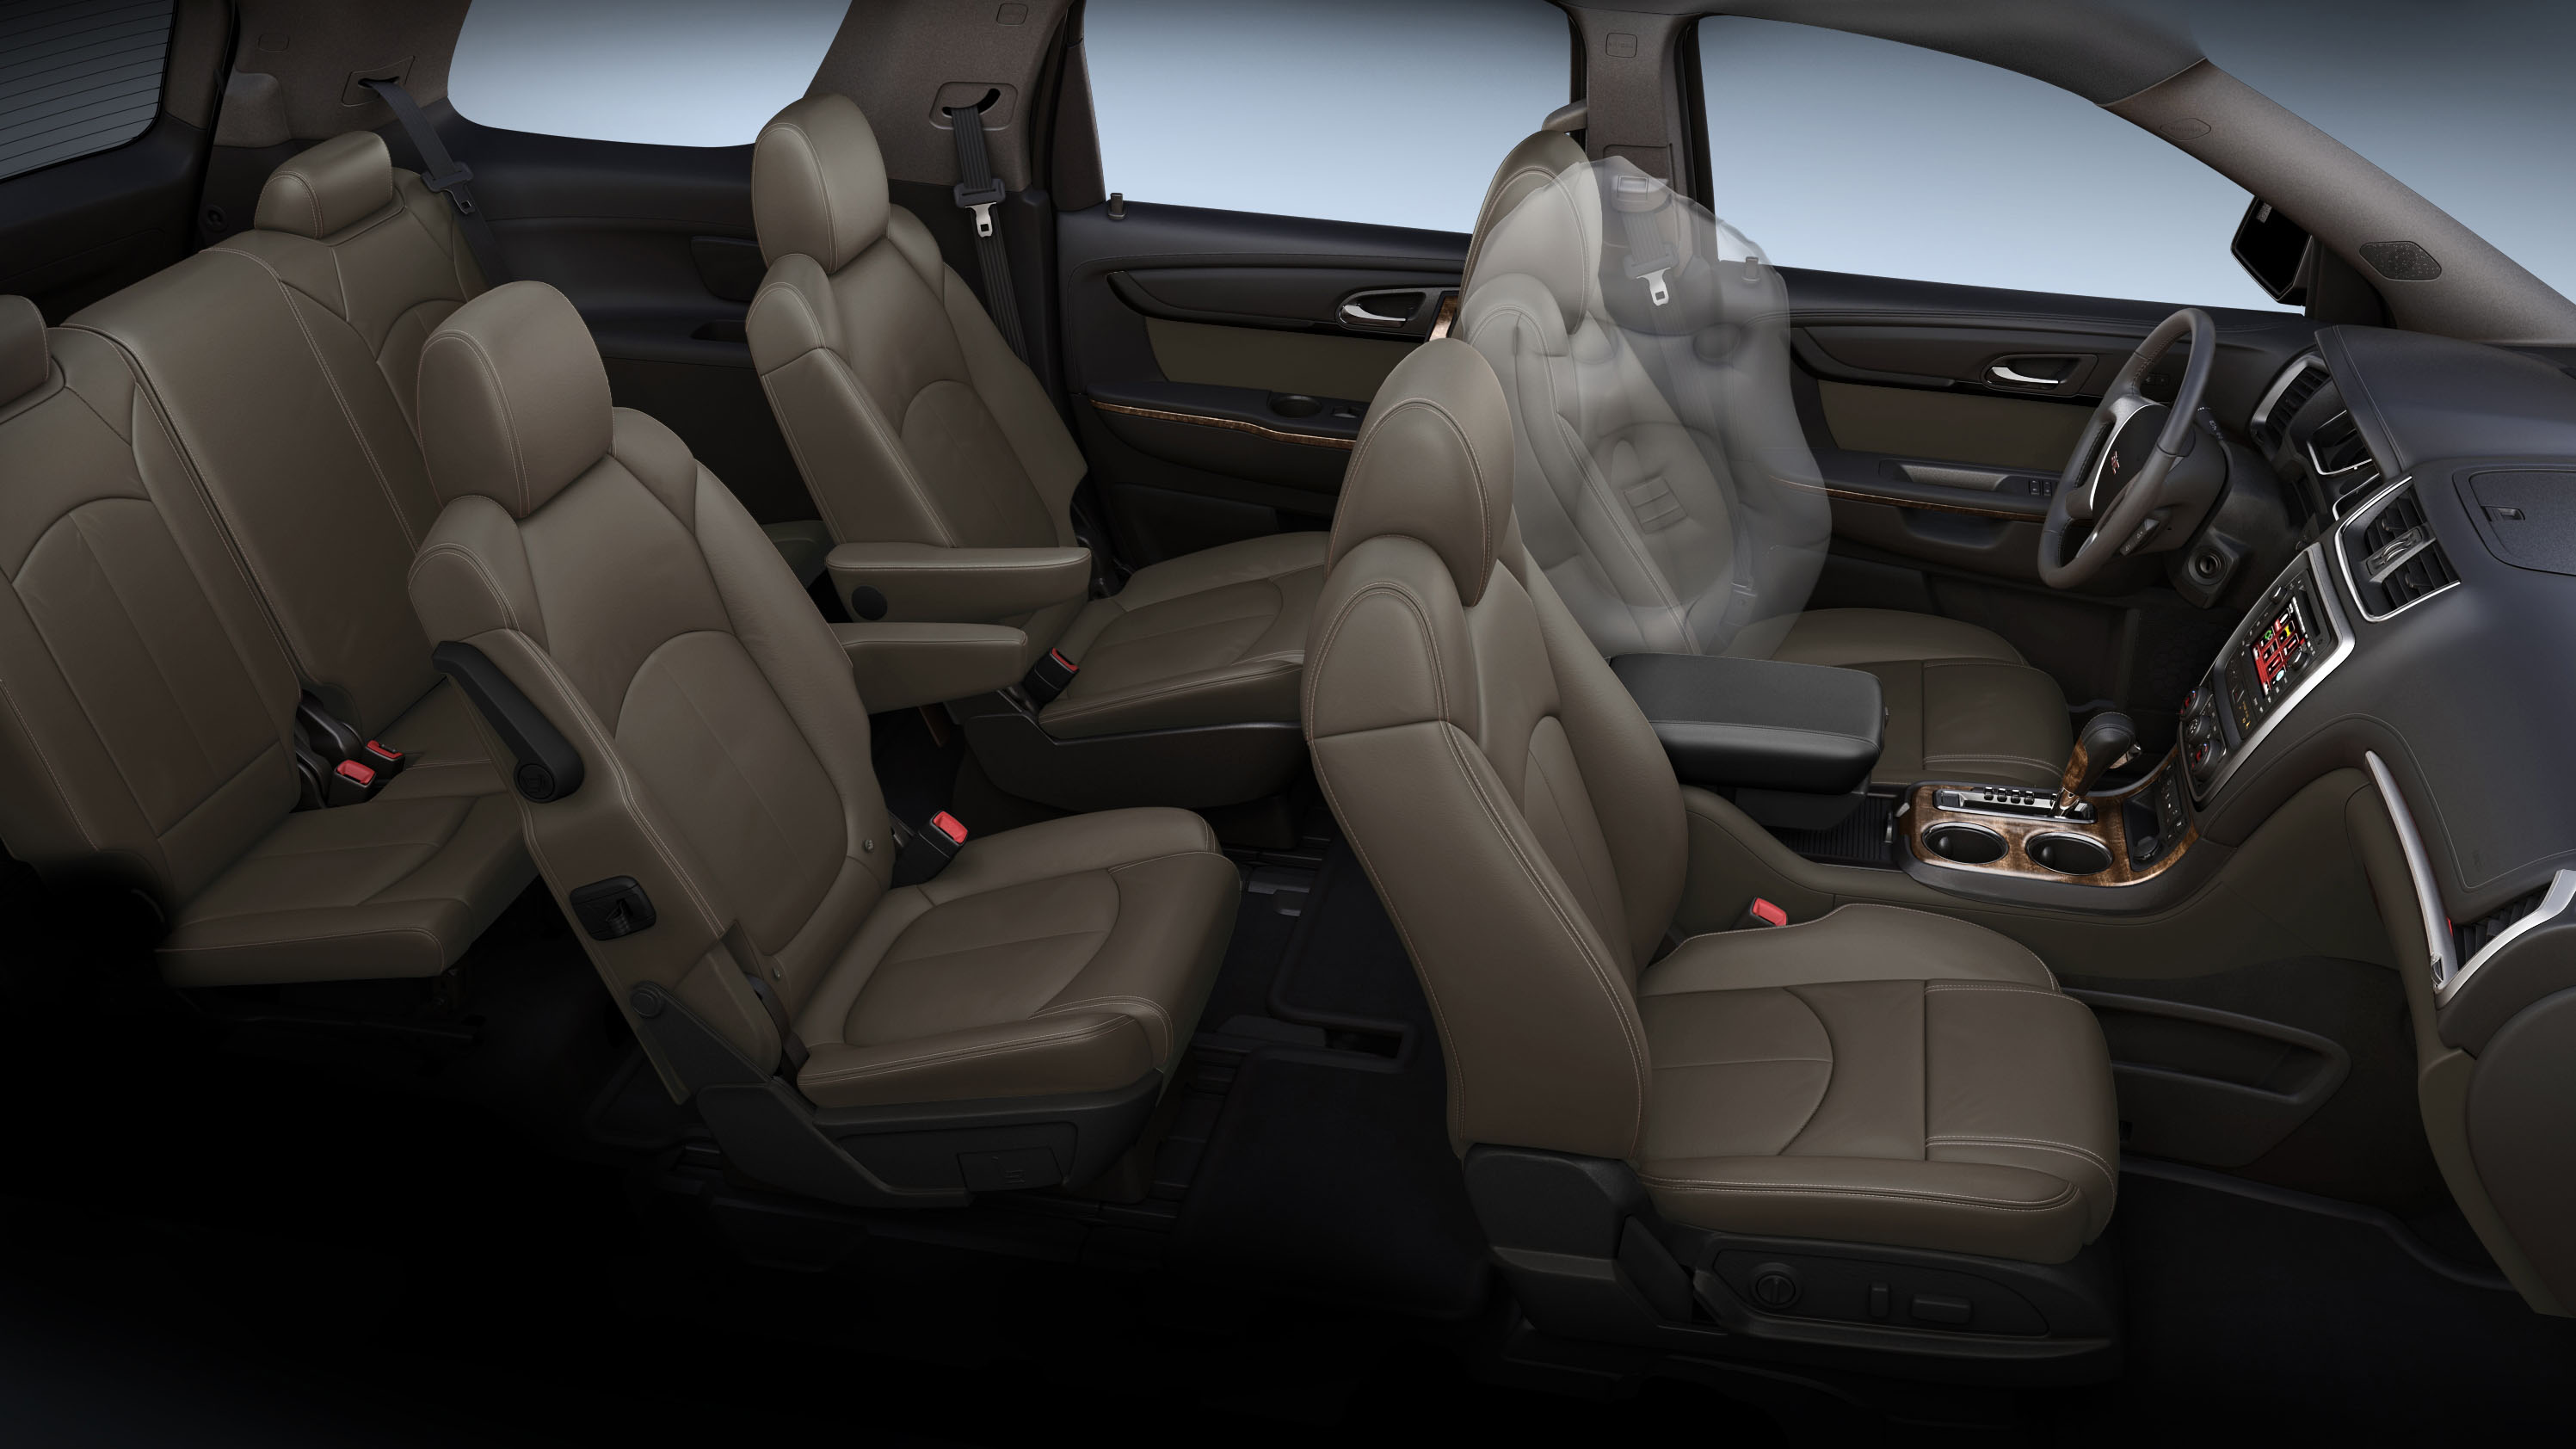 2013 GMC Acadia Airbags. (02/08/2012)